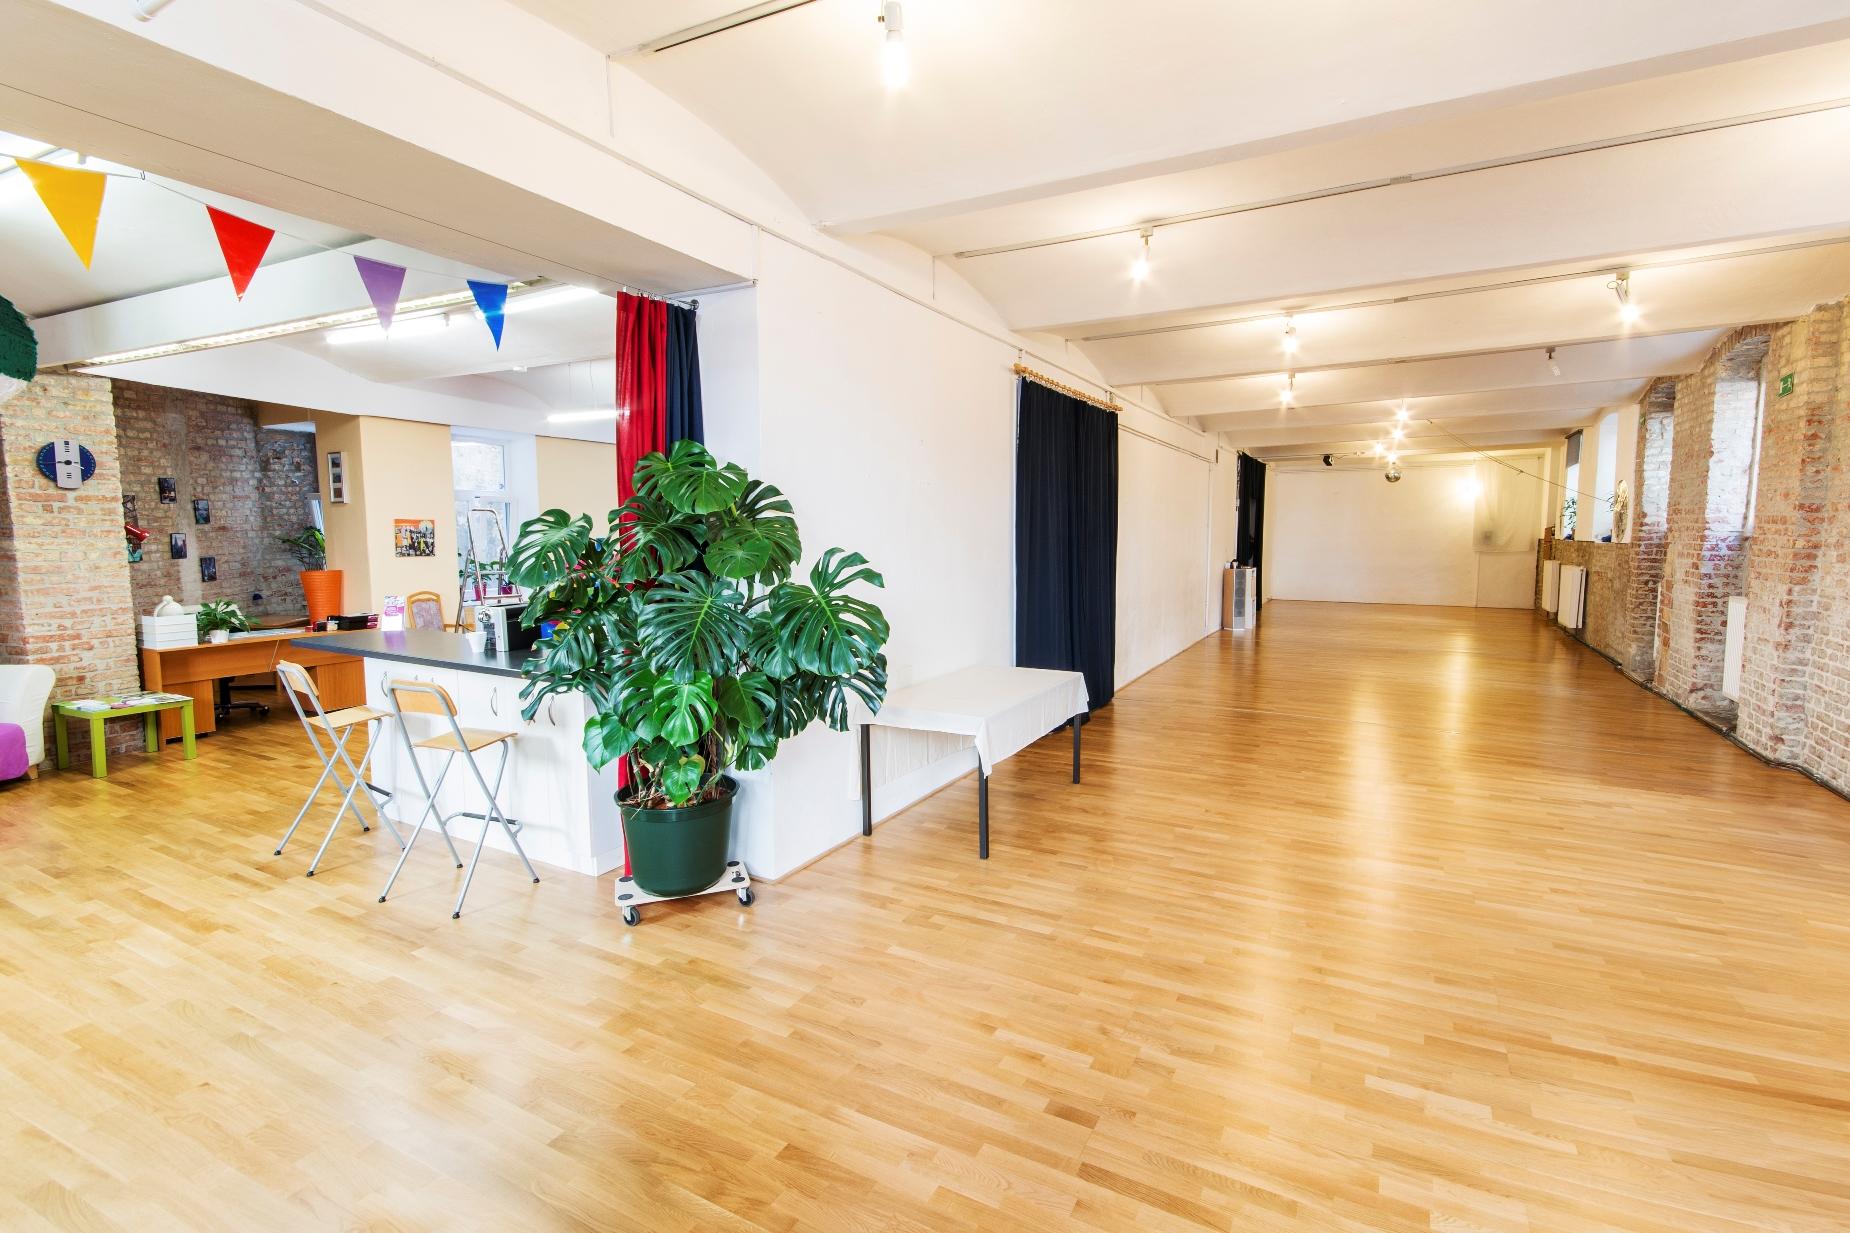 partys raummiete mehrspielraum workshops kinderbetreuung wien. Black Bedroom Furniture Sets. Home Design Ideas